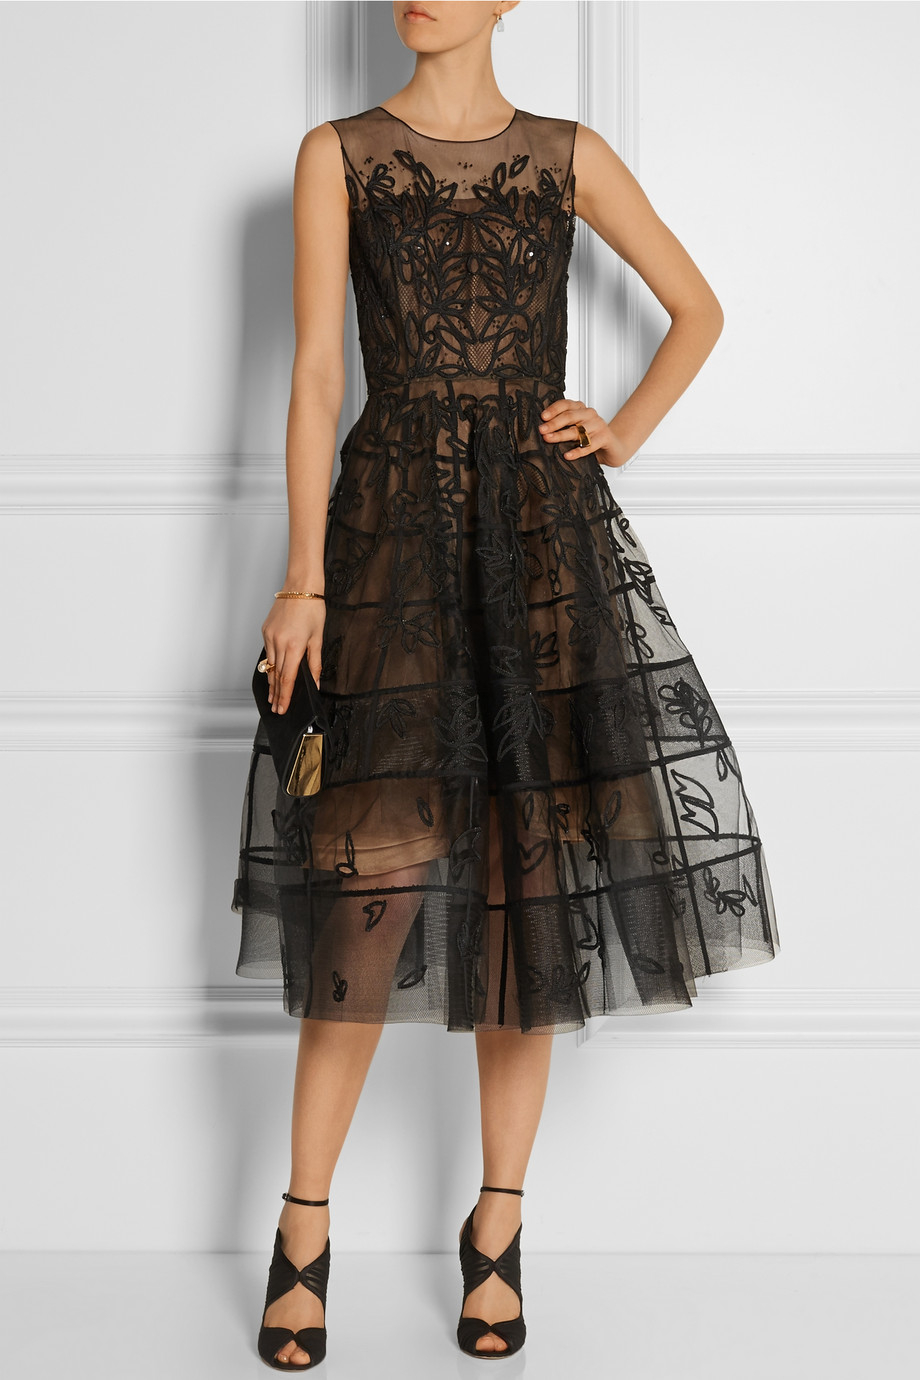 Lyst Oscar De La Renta Appliqud Tulle Midi Dress In Black